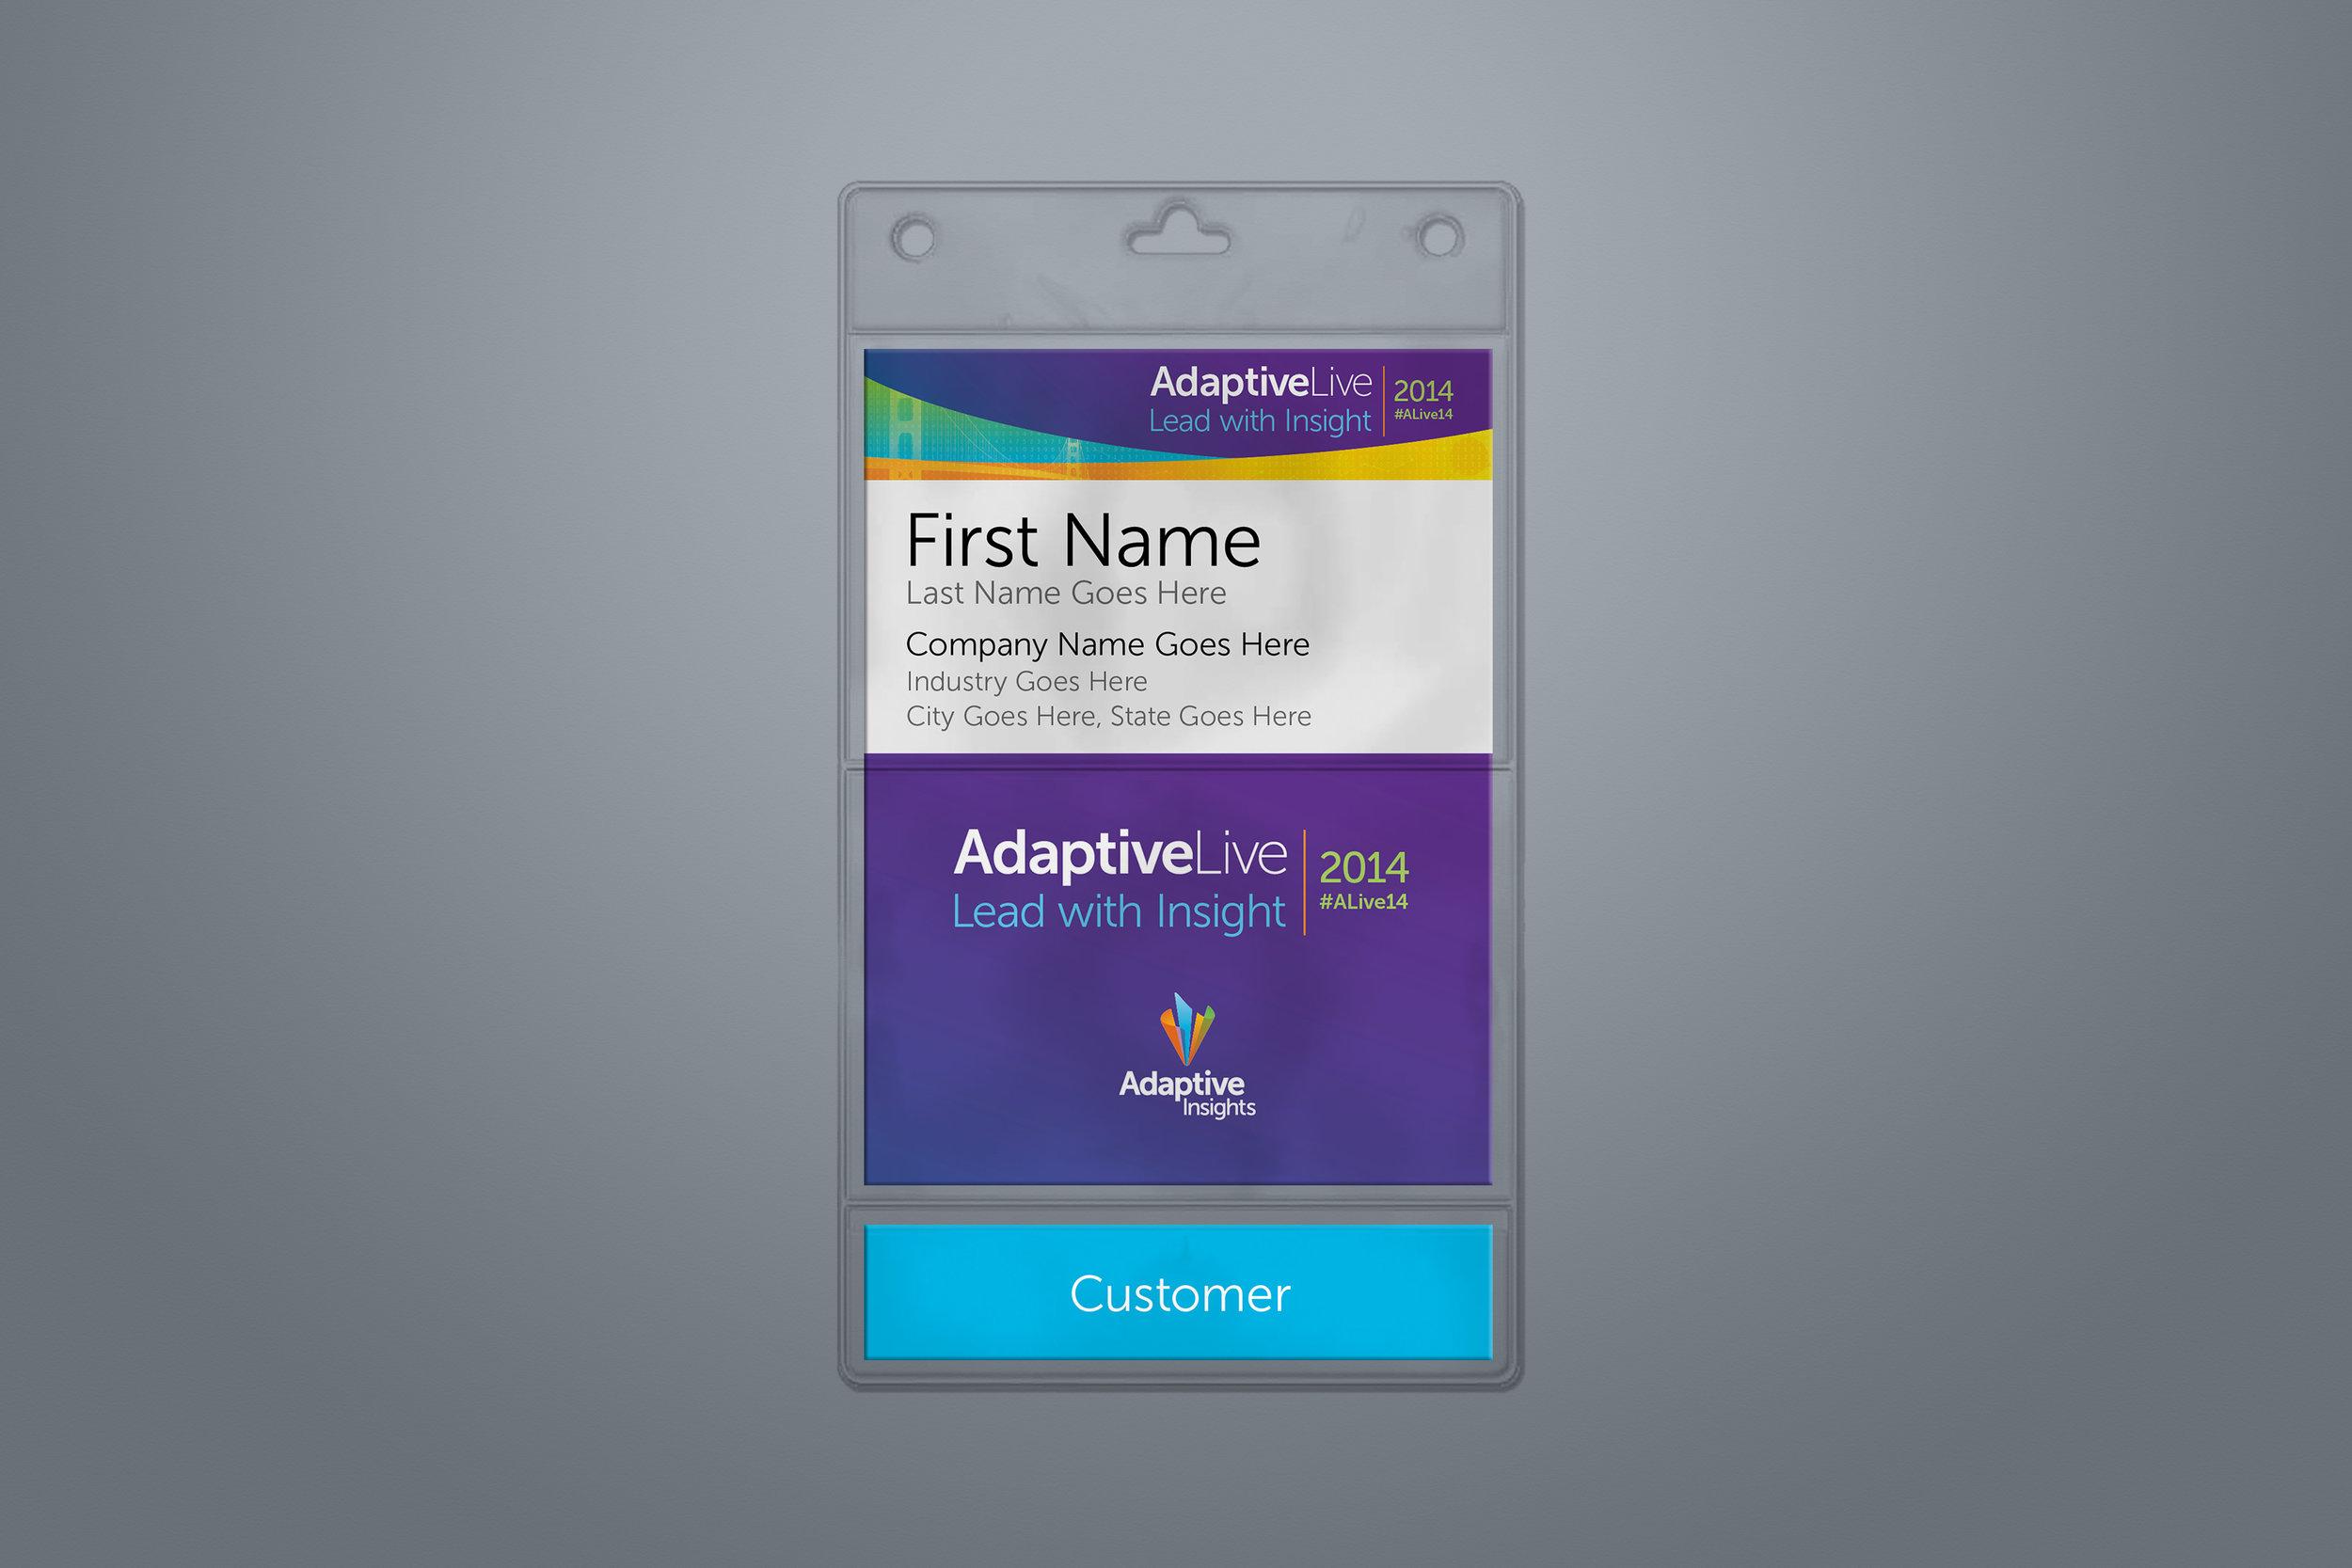 AdaptiveLive2014_Badge_Holder_Mockup_3.jpg